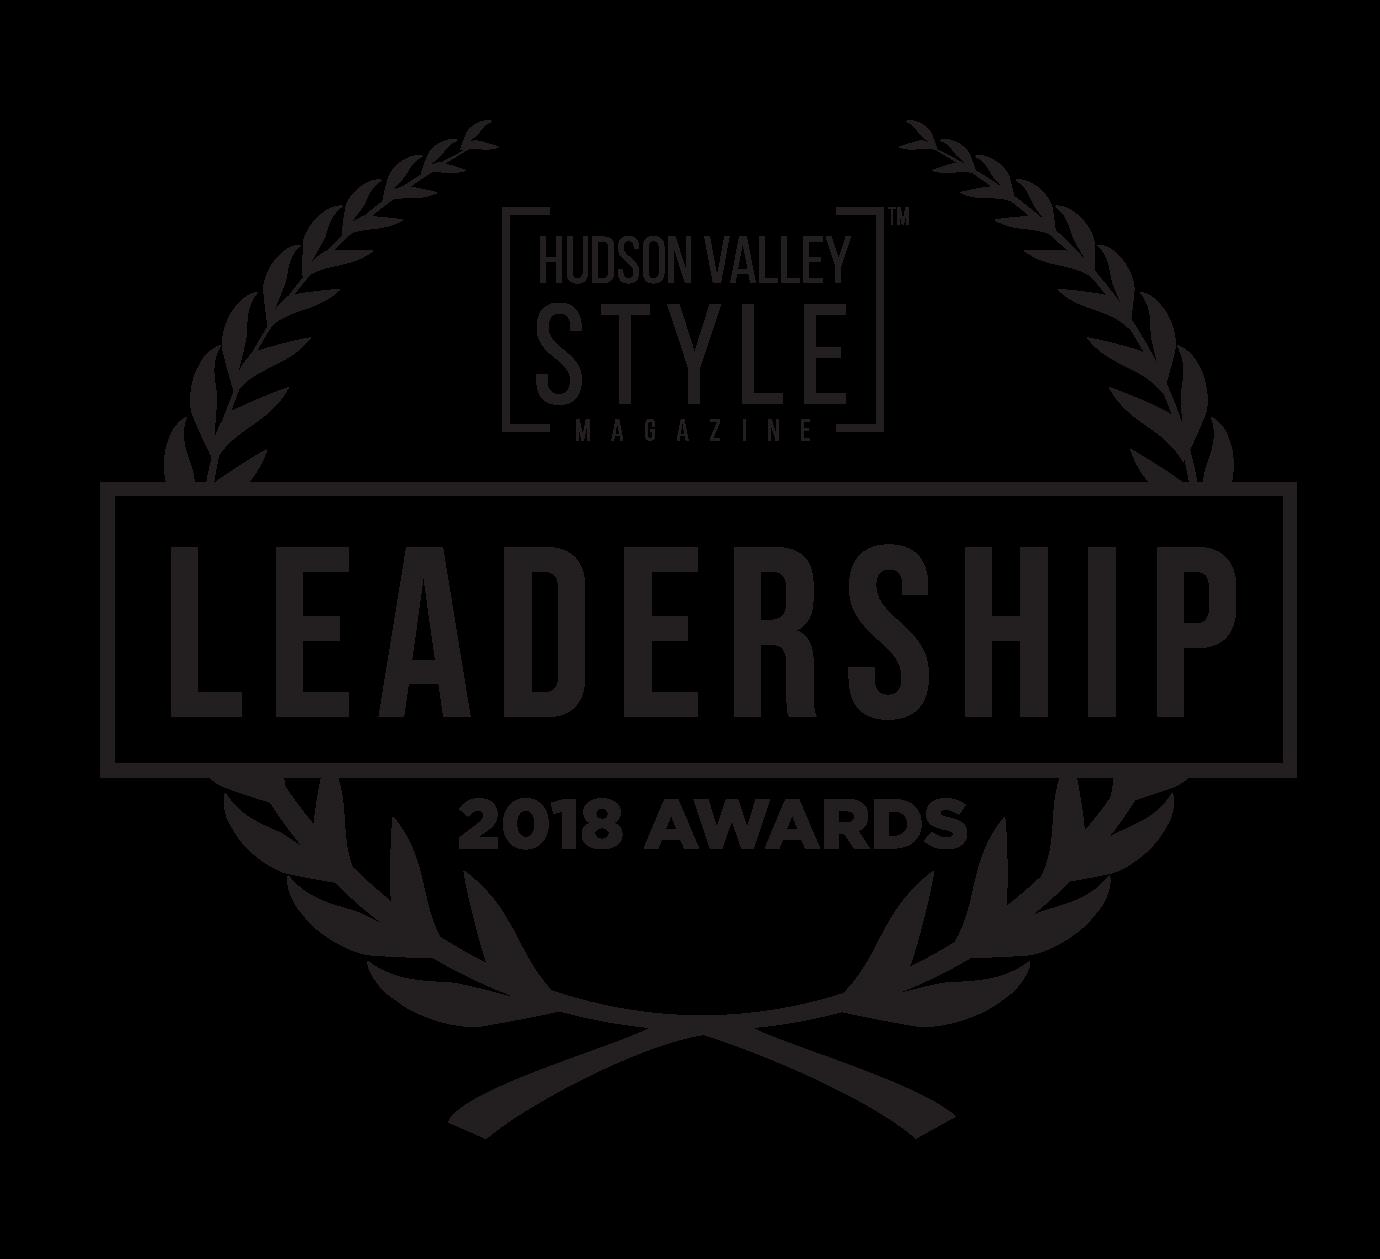 Hudson Valley Style Magazine Awards: Leadership